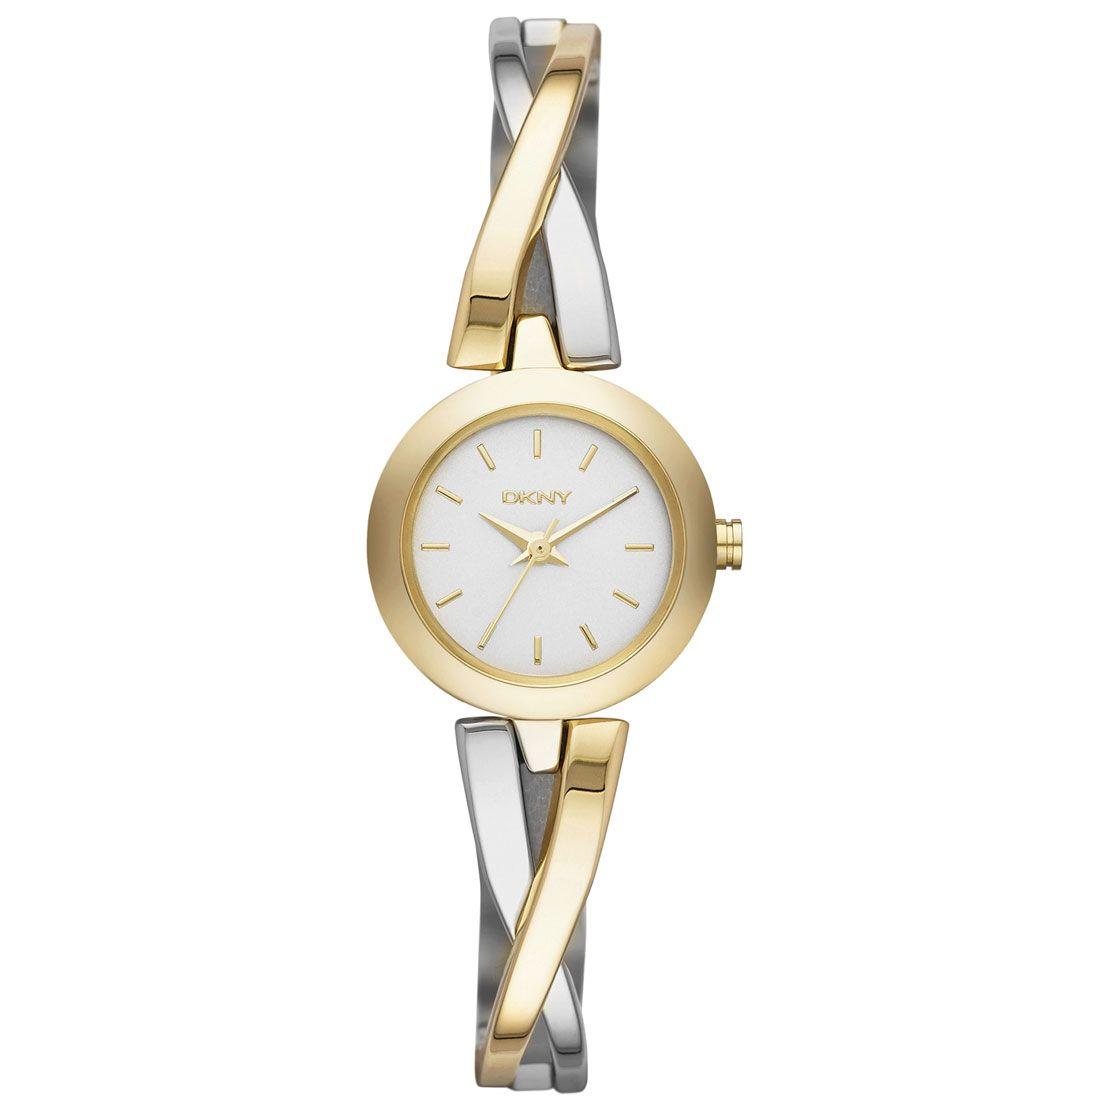 Dkny Ny2171 Bayan Kol Saati Saat Ve Saat Bracelet Watch Bangle Watches Dkny Watch